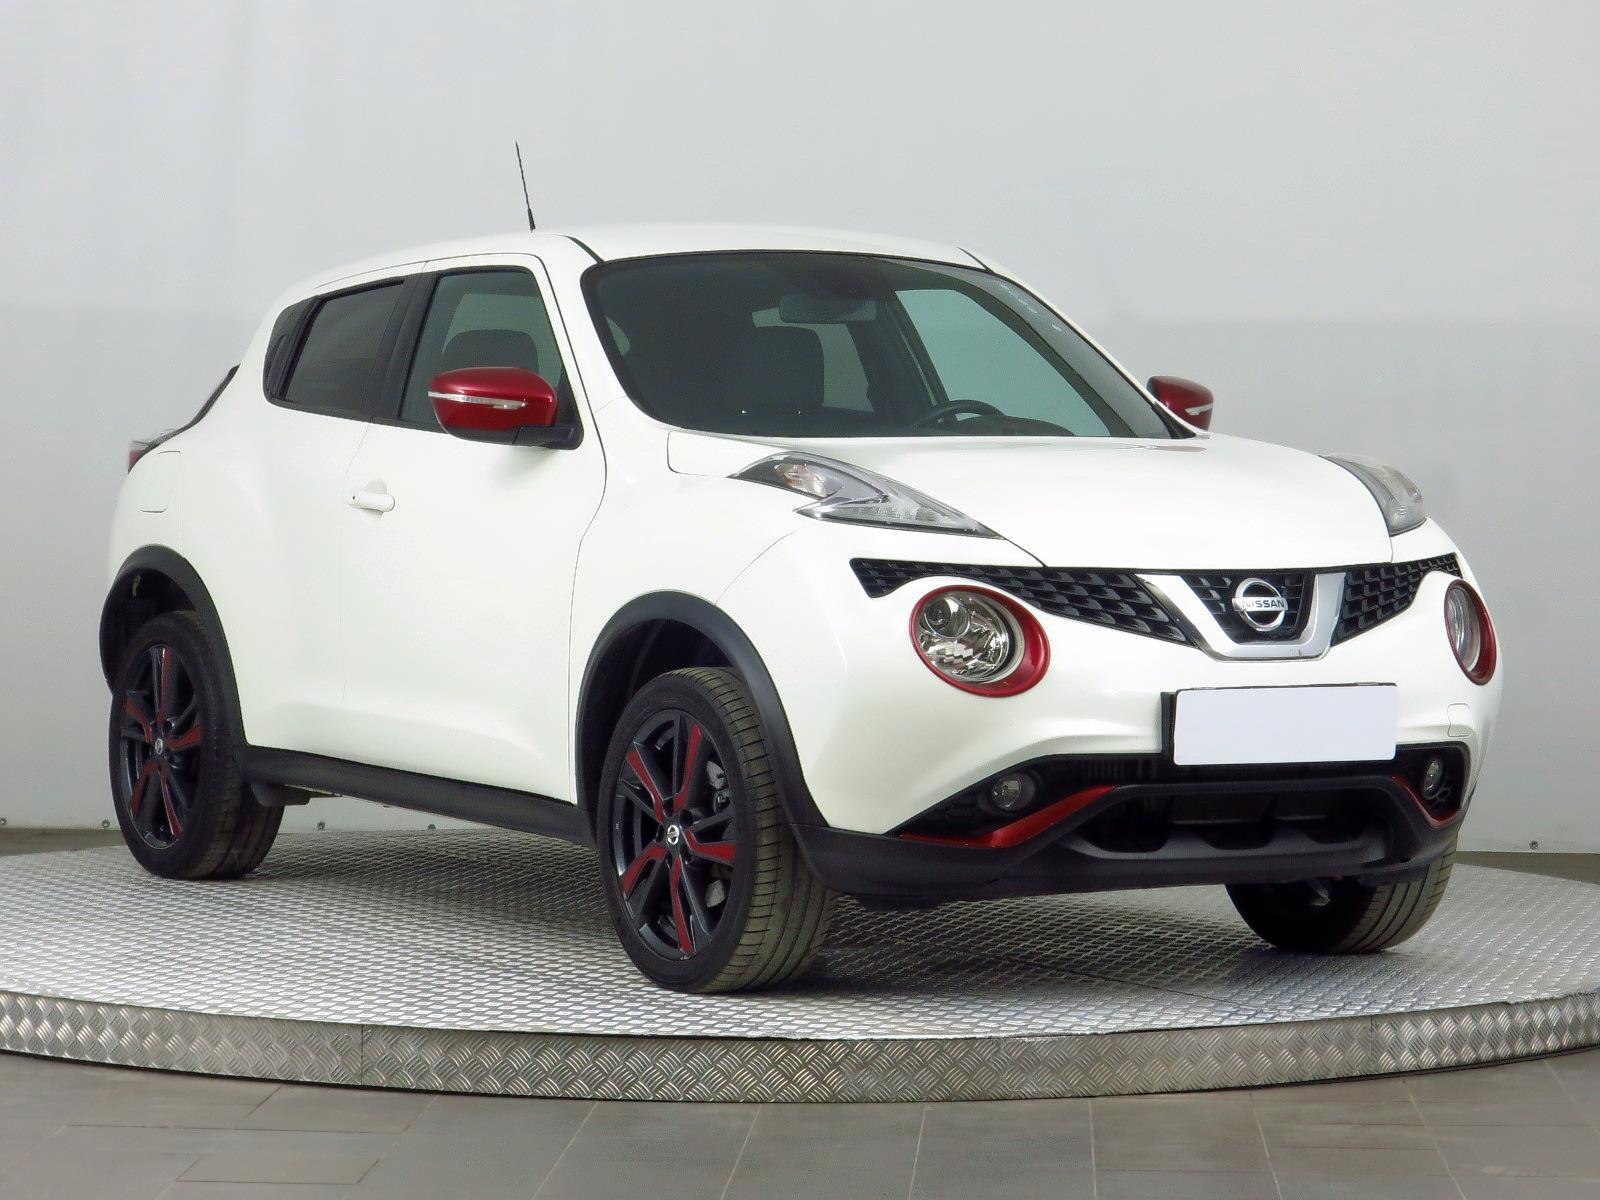 Nissan Juke 1.6 DIG-T 140kW SUV benzin